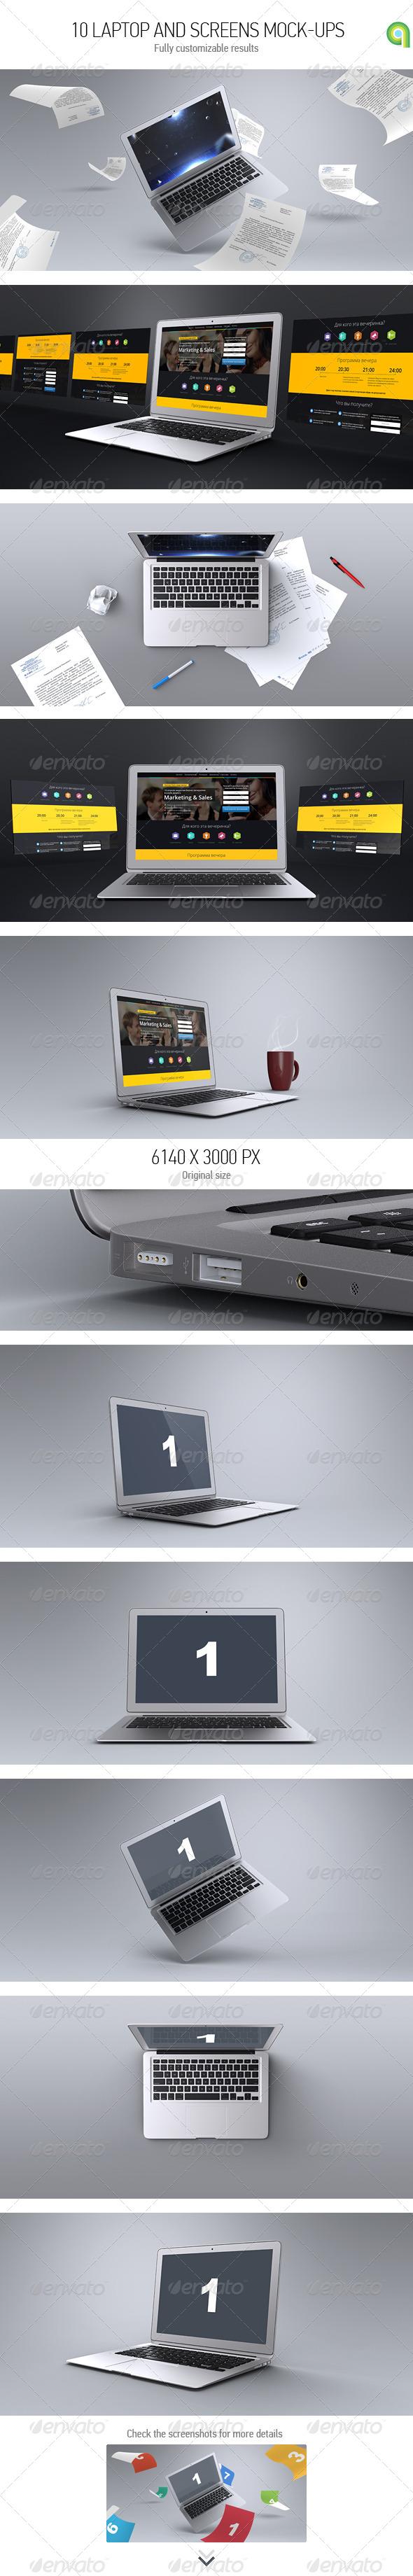 Laptop & Screen Mockup